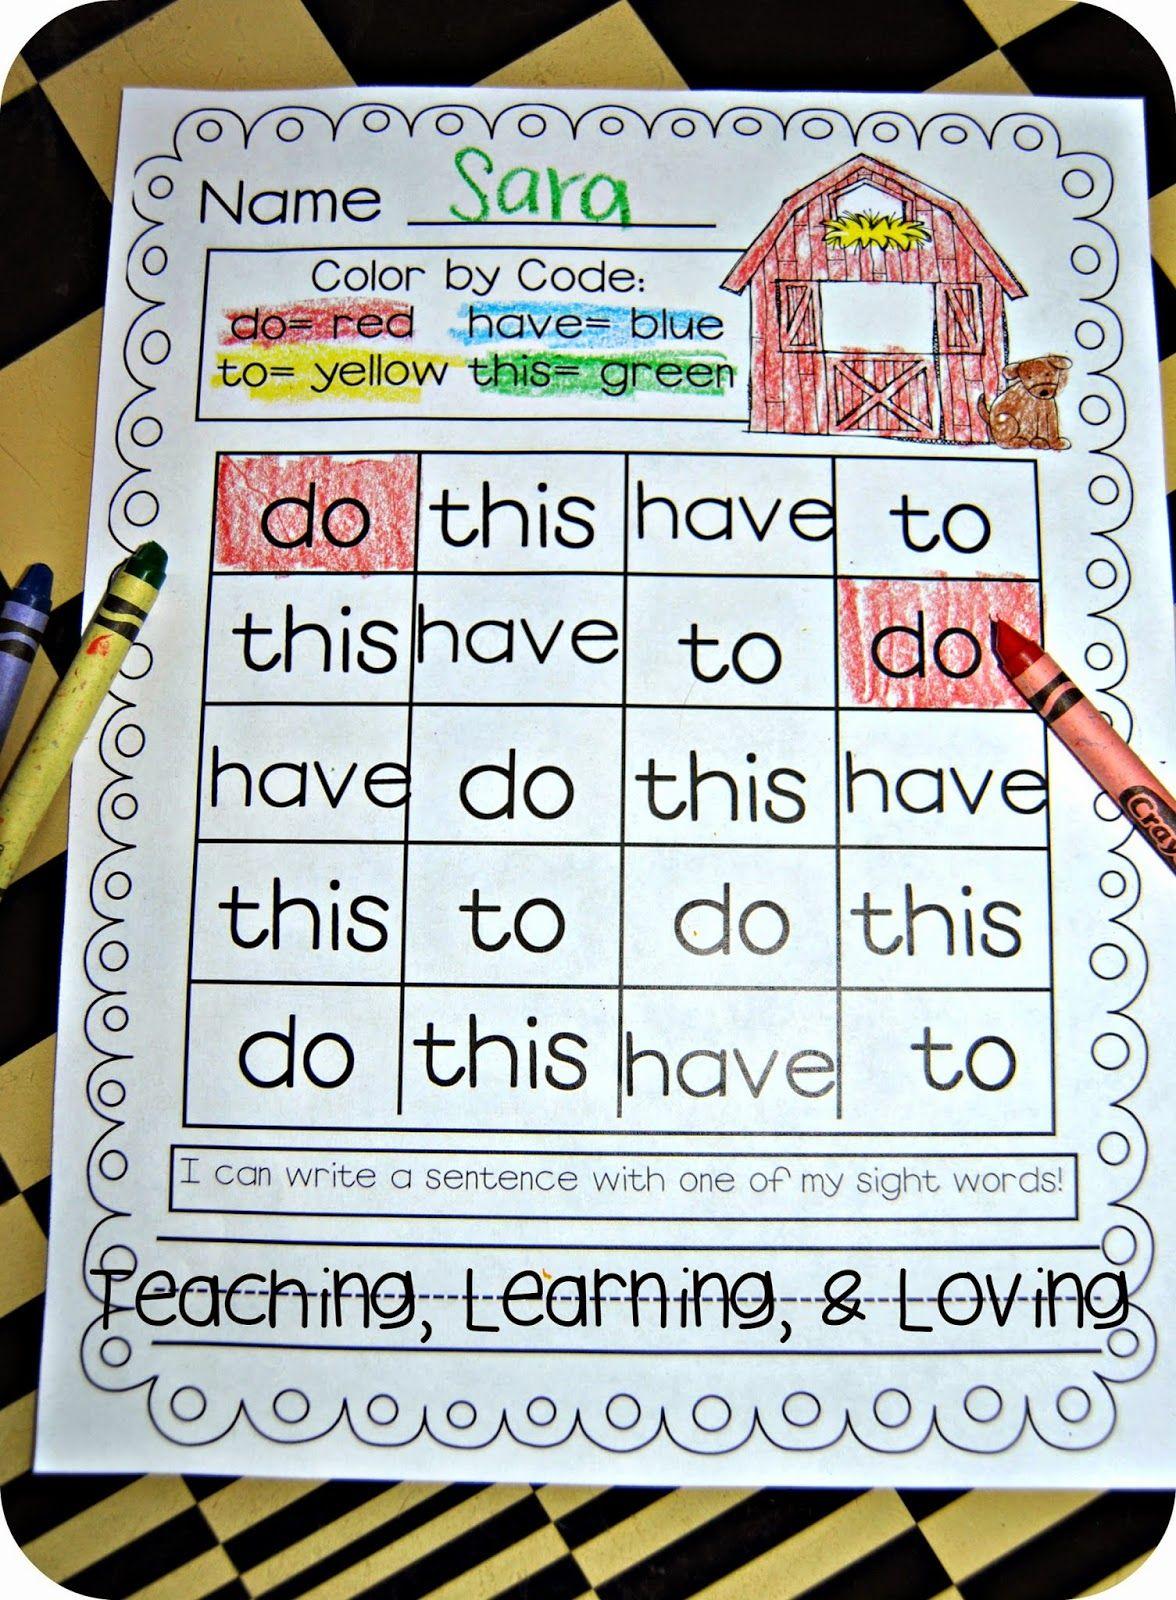 Workbooks kindergarten reading worksheets sight words : 25 Ways to Teach Sight Words! | Creative Classroom Ideas ...